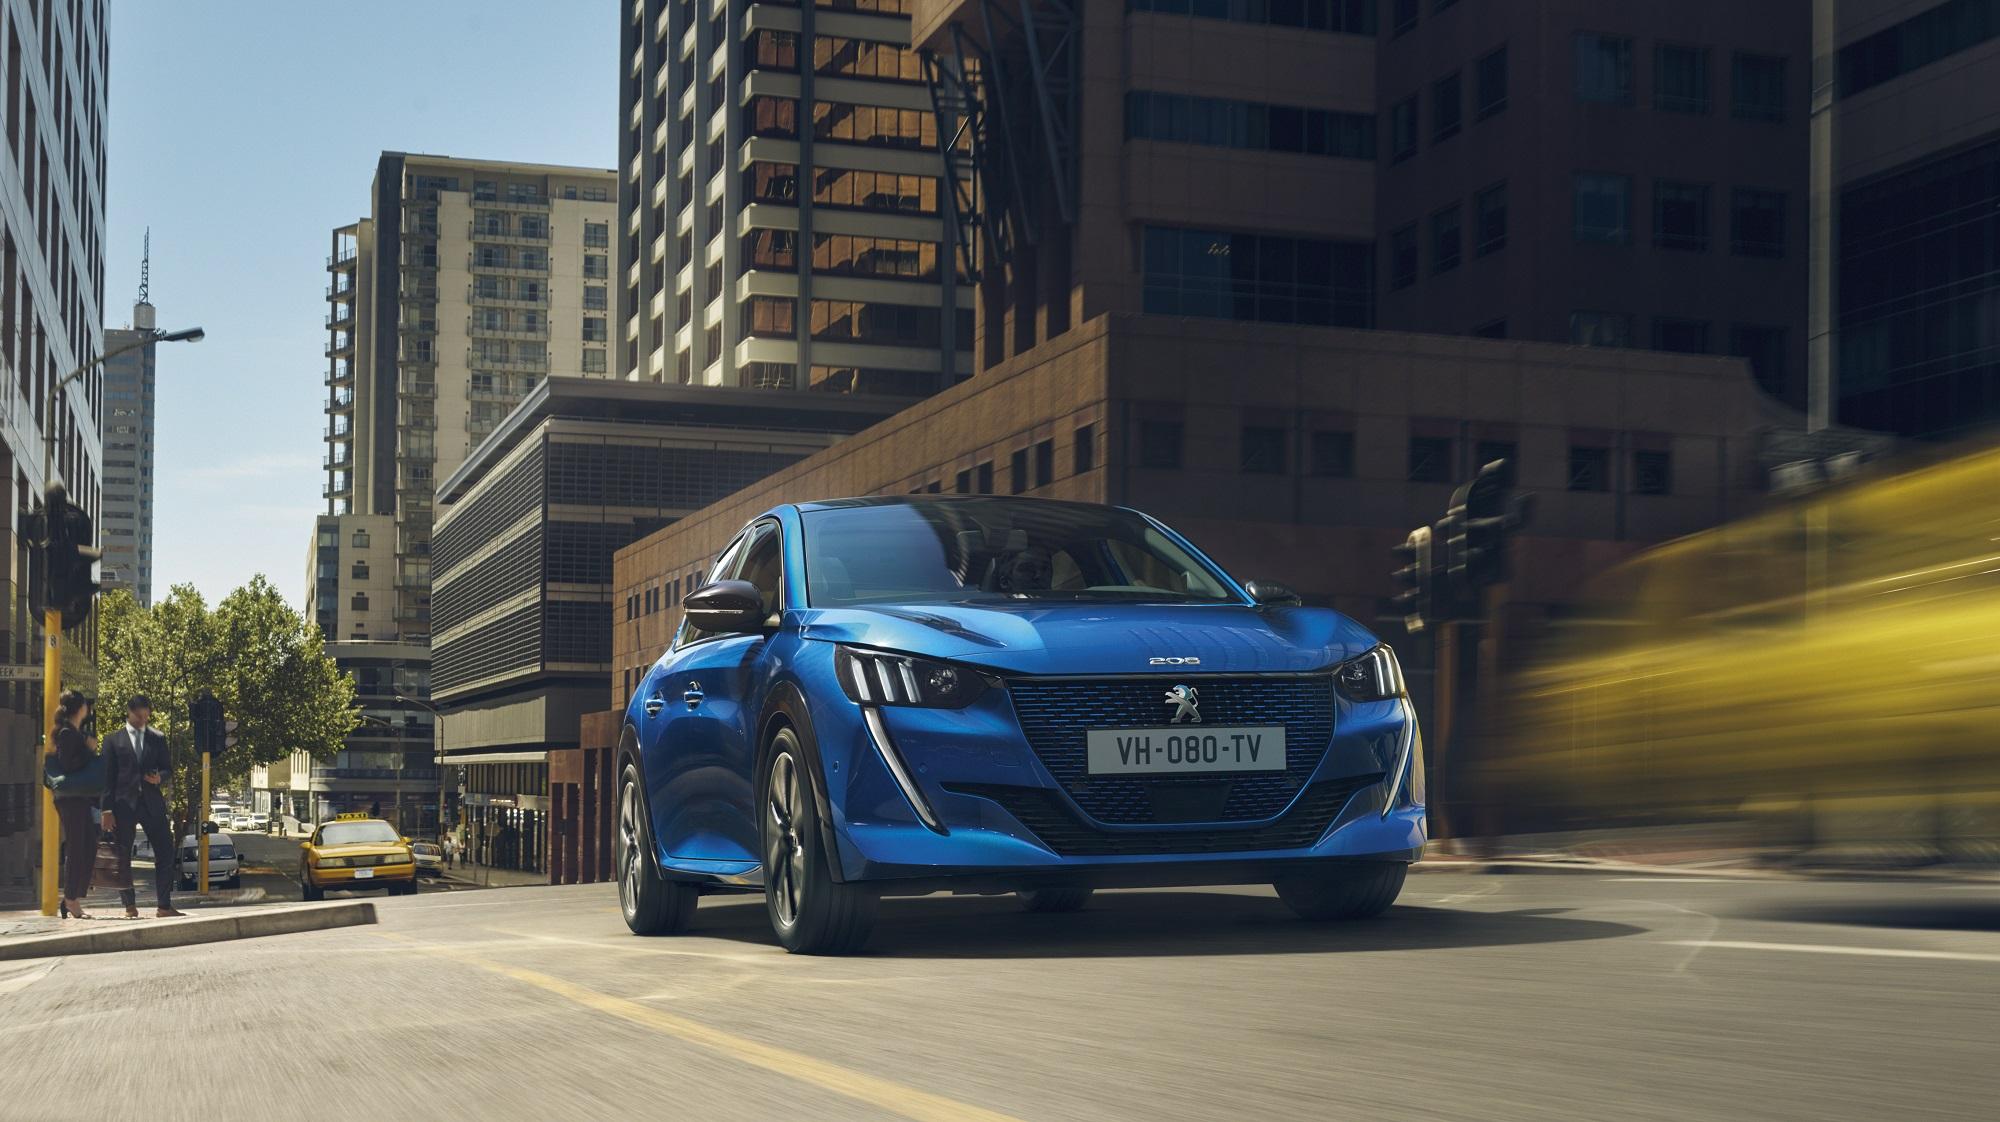 Nuova Peugeot 208 alla Milano Design Week 2019